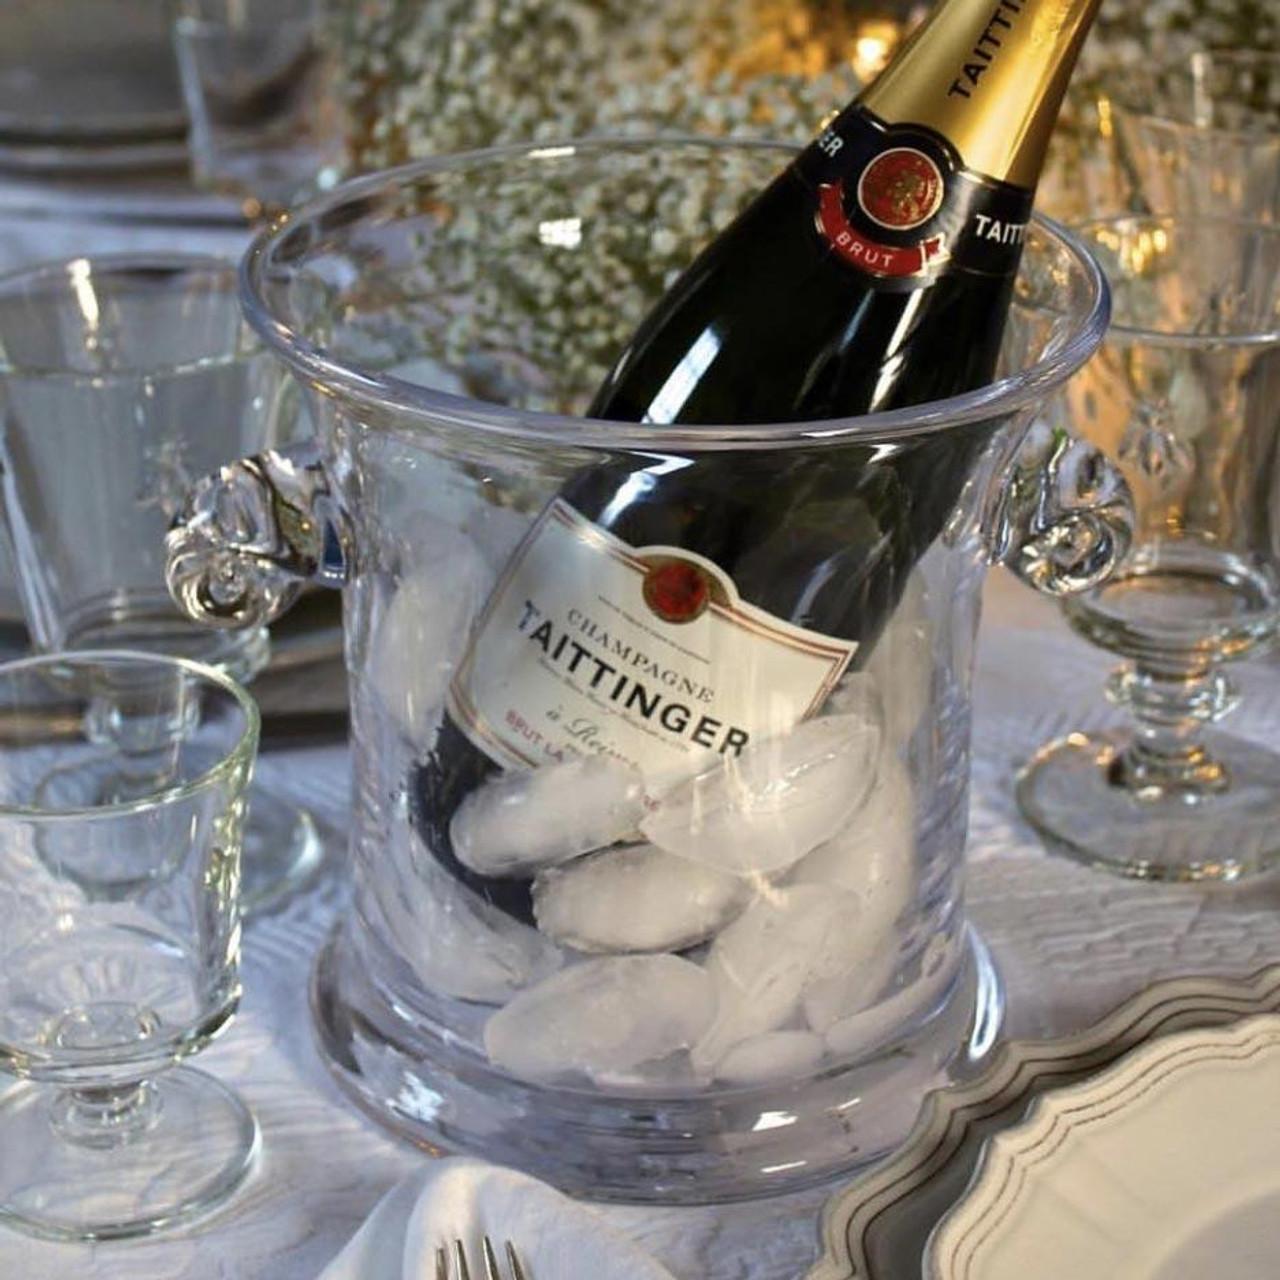 Champagne Taittinger, Champagne Brut La Francaise